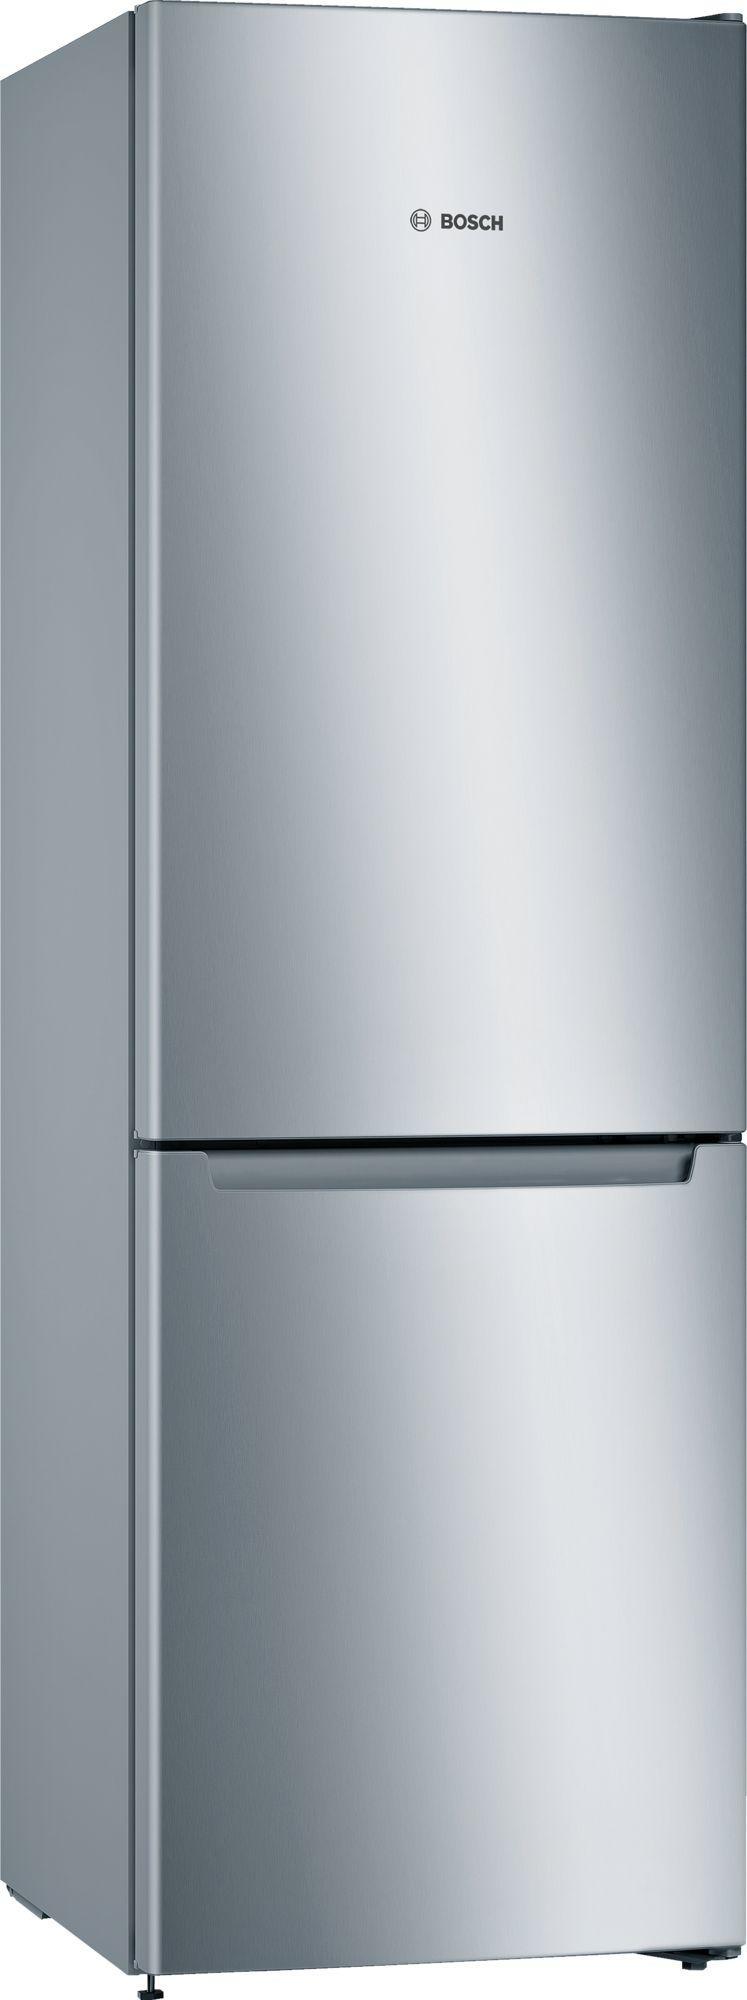 Image of Serie 2 KGN33NLEAG 60cm 279 Litre Frost Free Fridge Freezer | Silver Innox